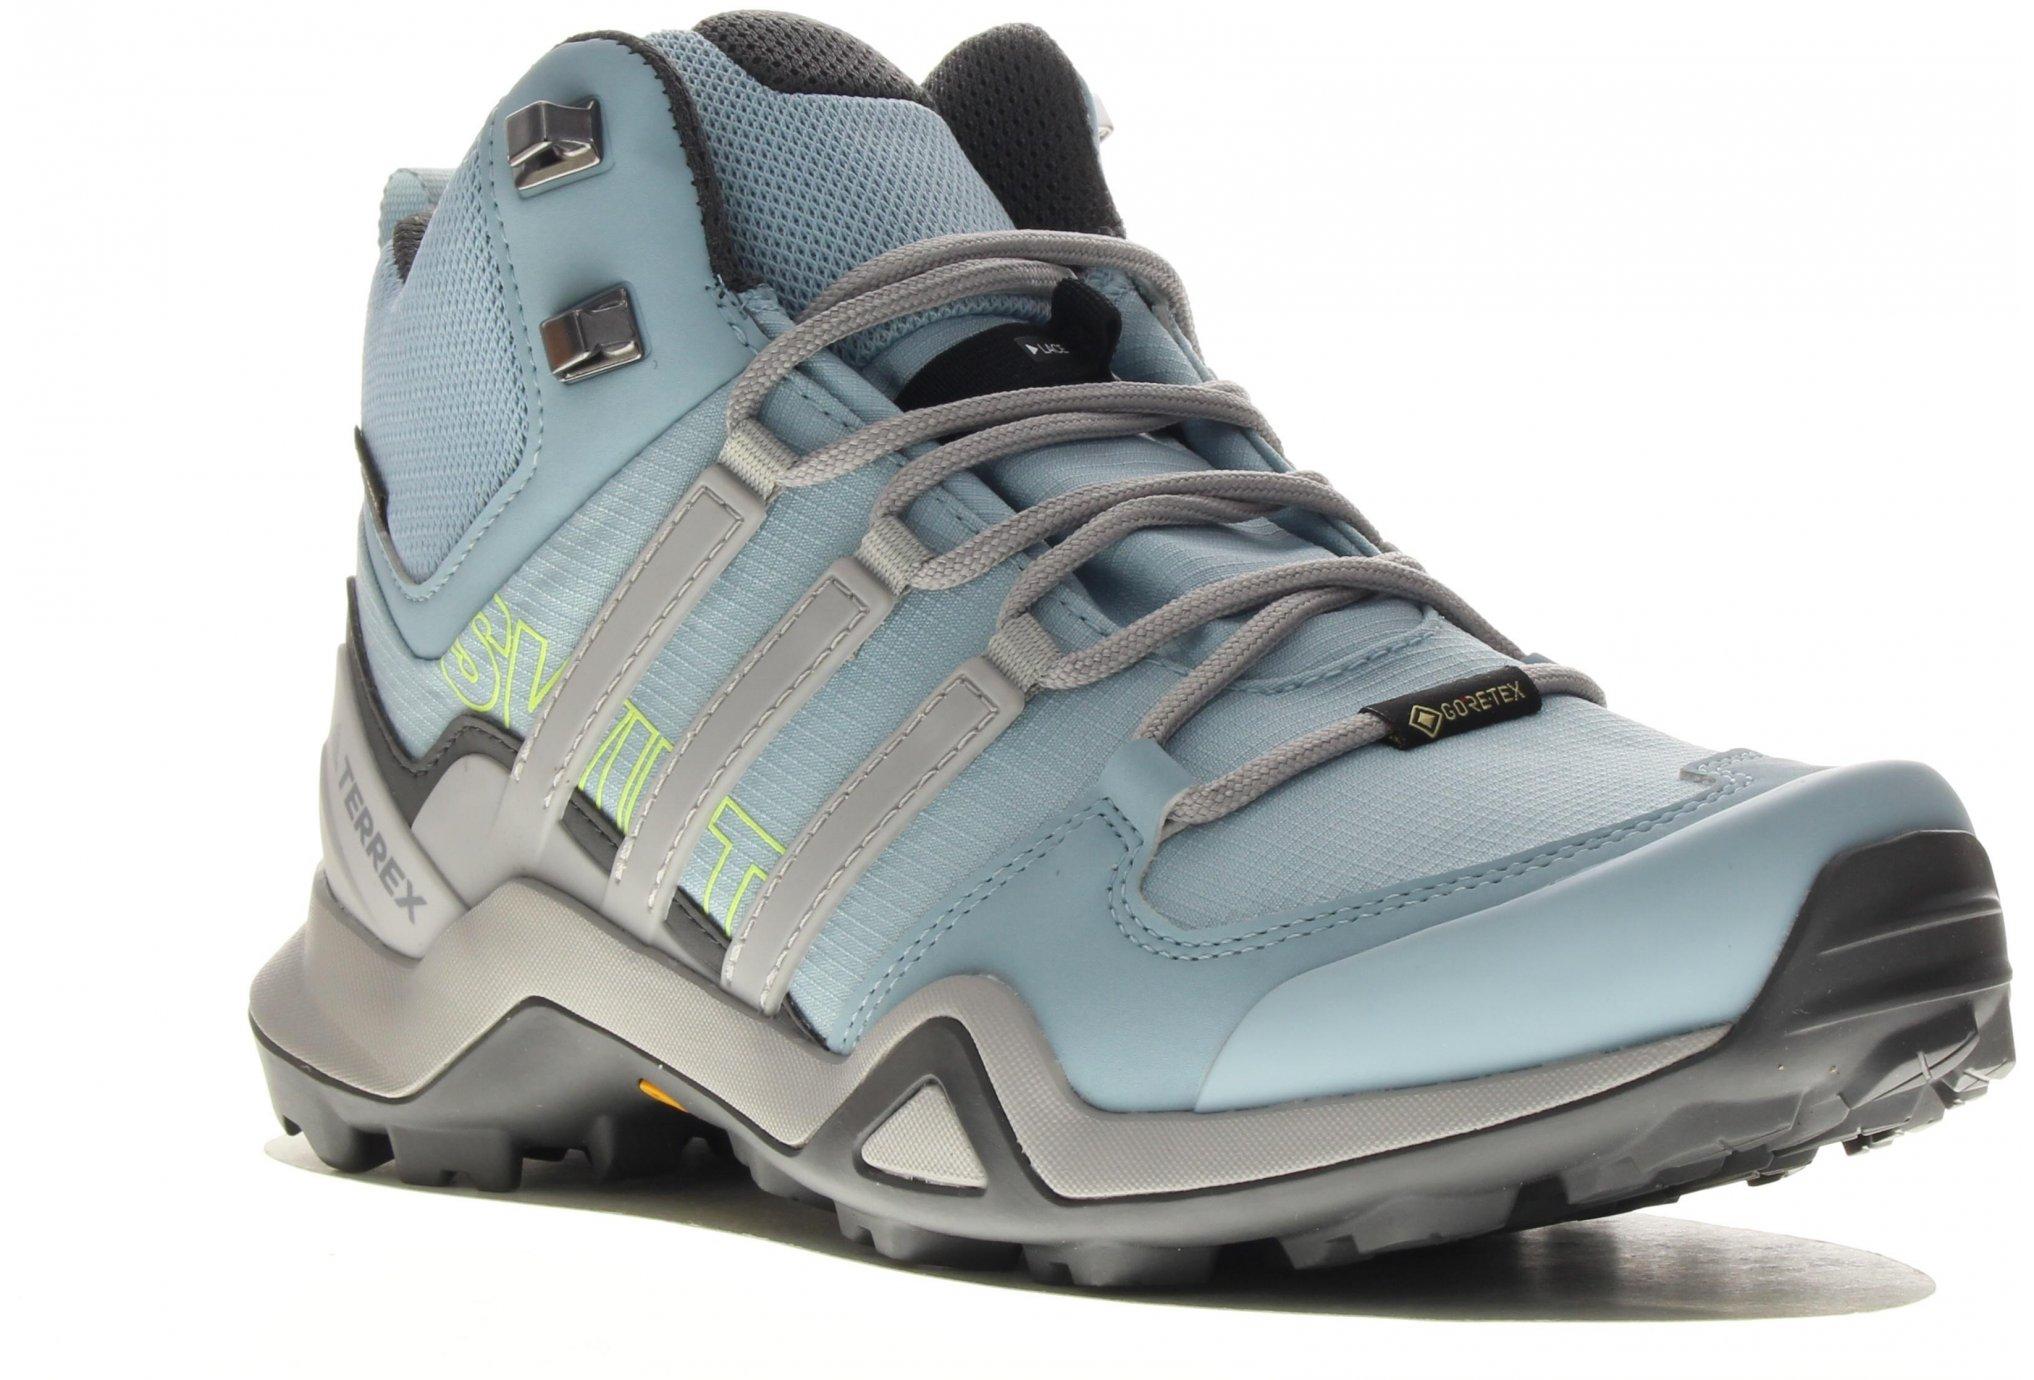 Adidas Terrex swift r2 mid gore-Tex w diététique chaussures femme